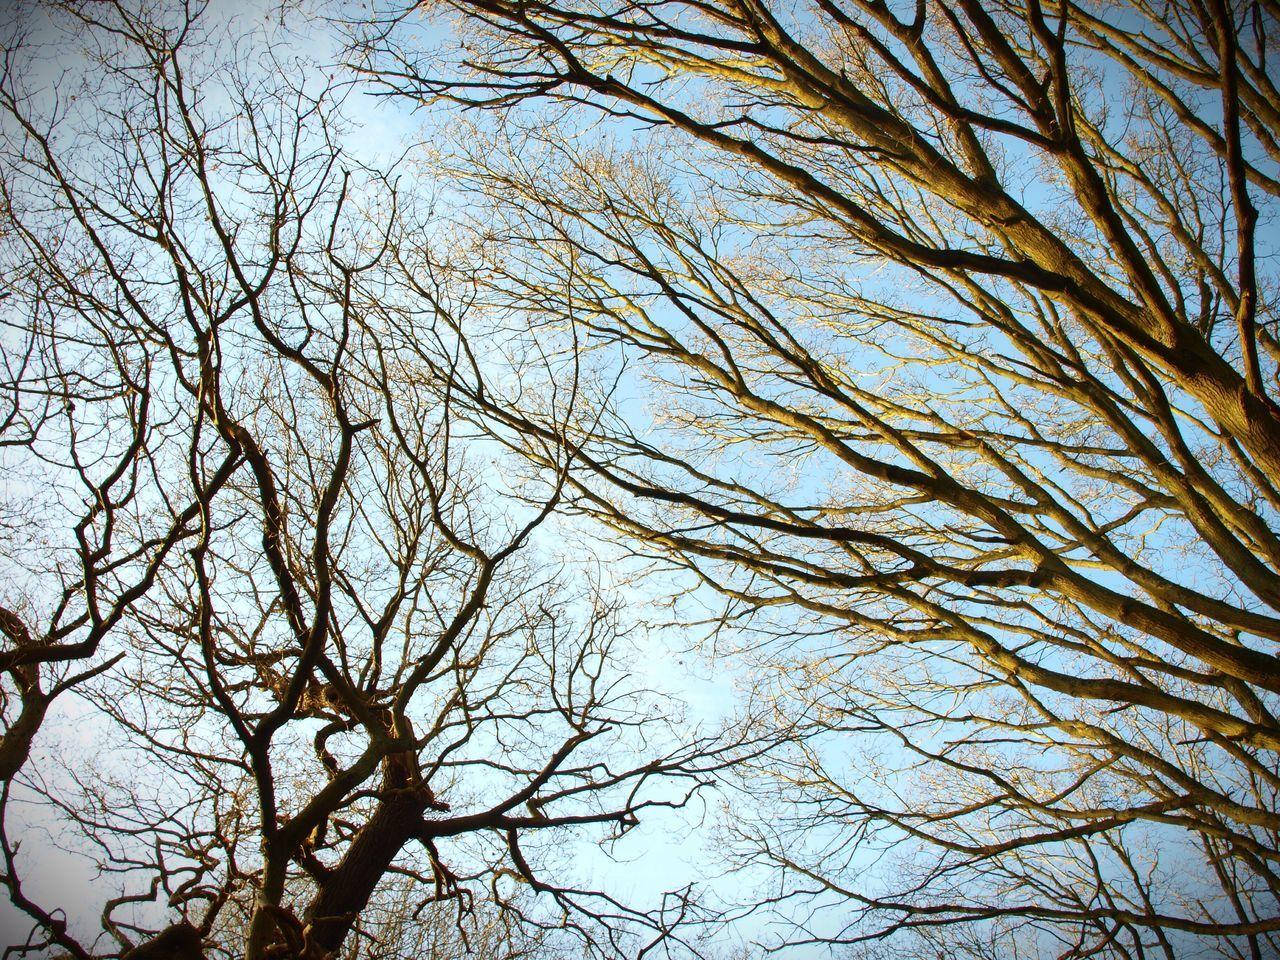 Stevesevilempire London TreePorn Nature Olympus Outdoors Trees Zuiko Forest Steve Merrick Hampstead Heath